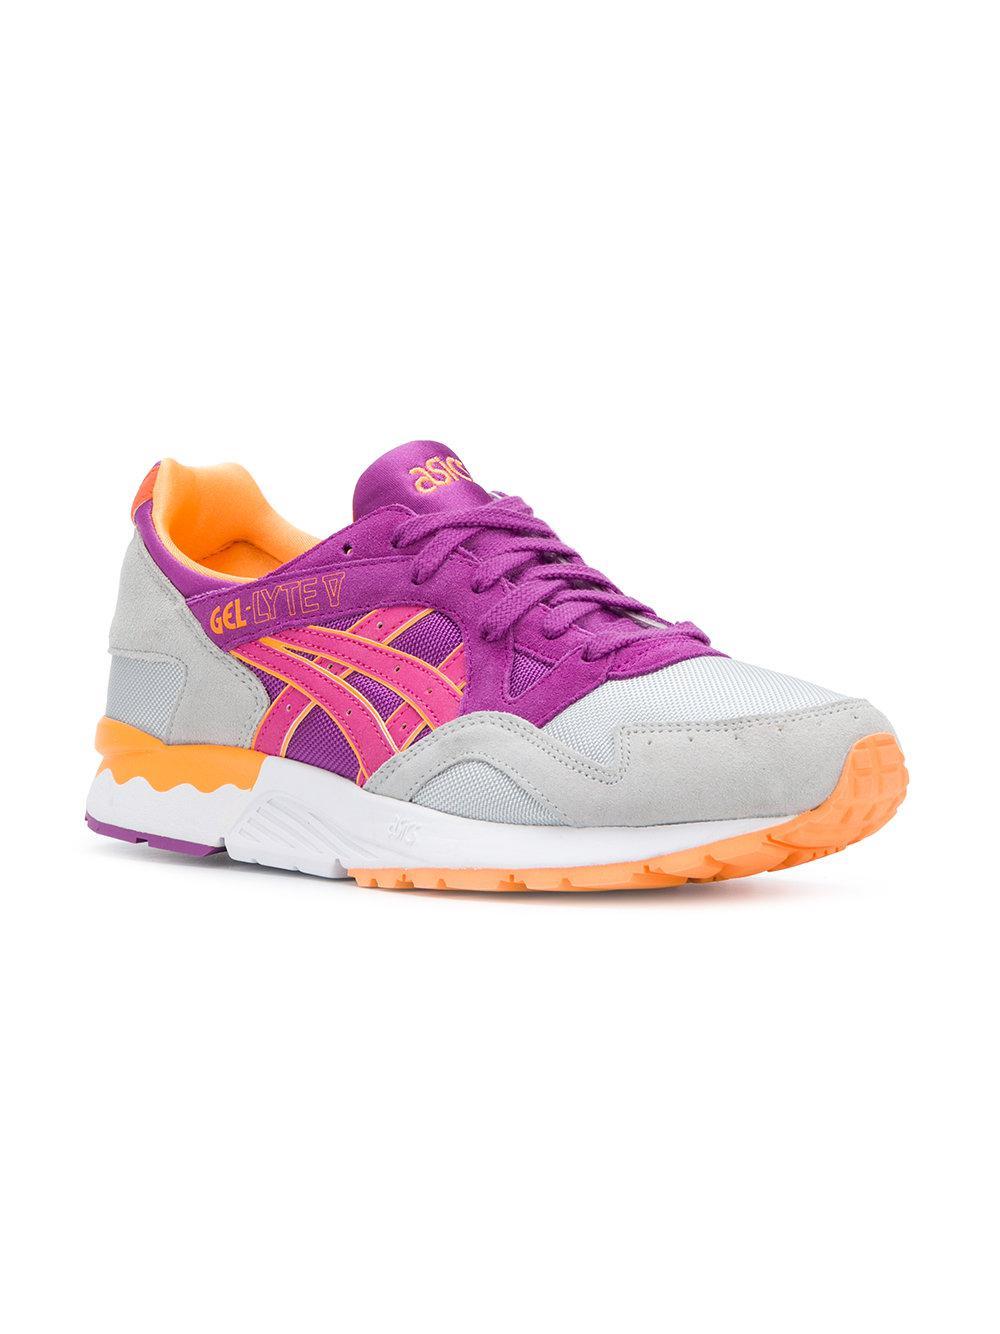 Lyte Lyst Asics V Gel Purple Sneakers In wAUpgq